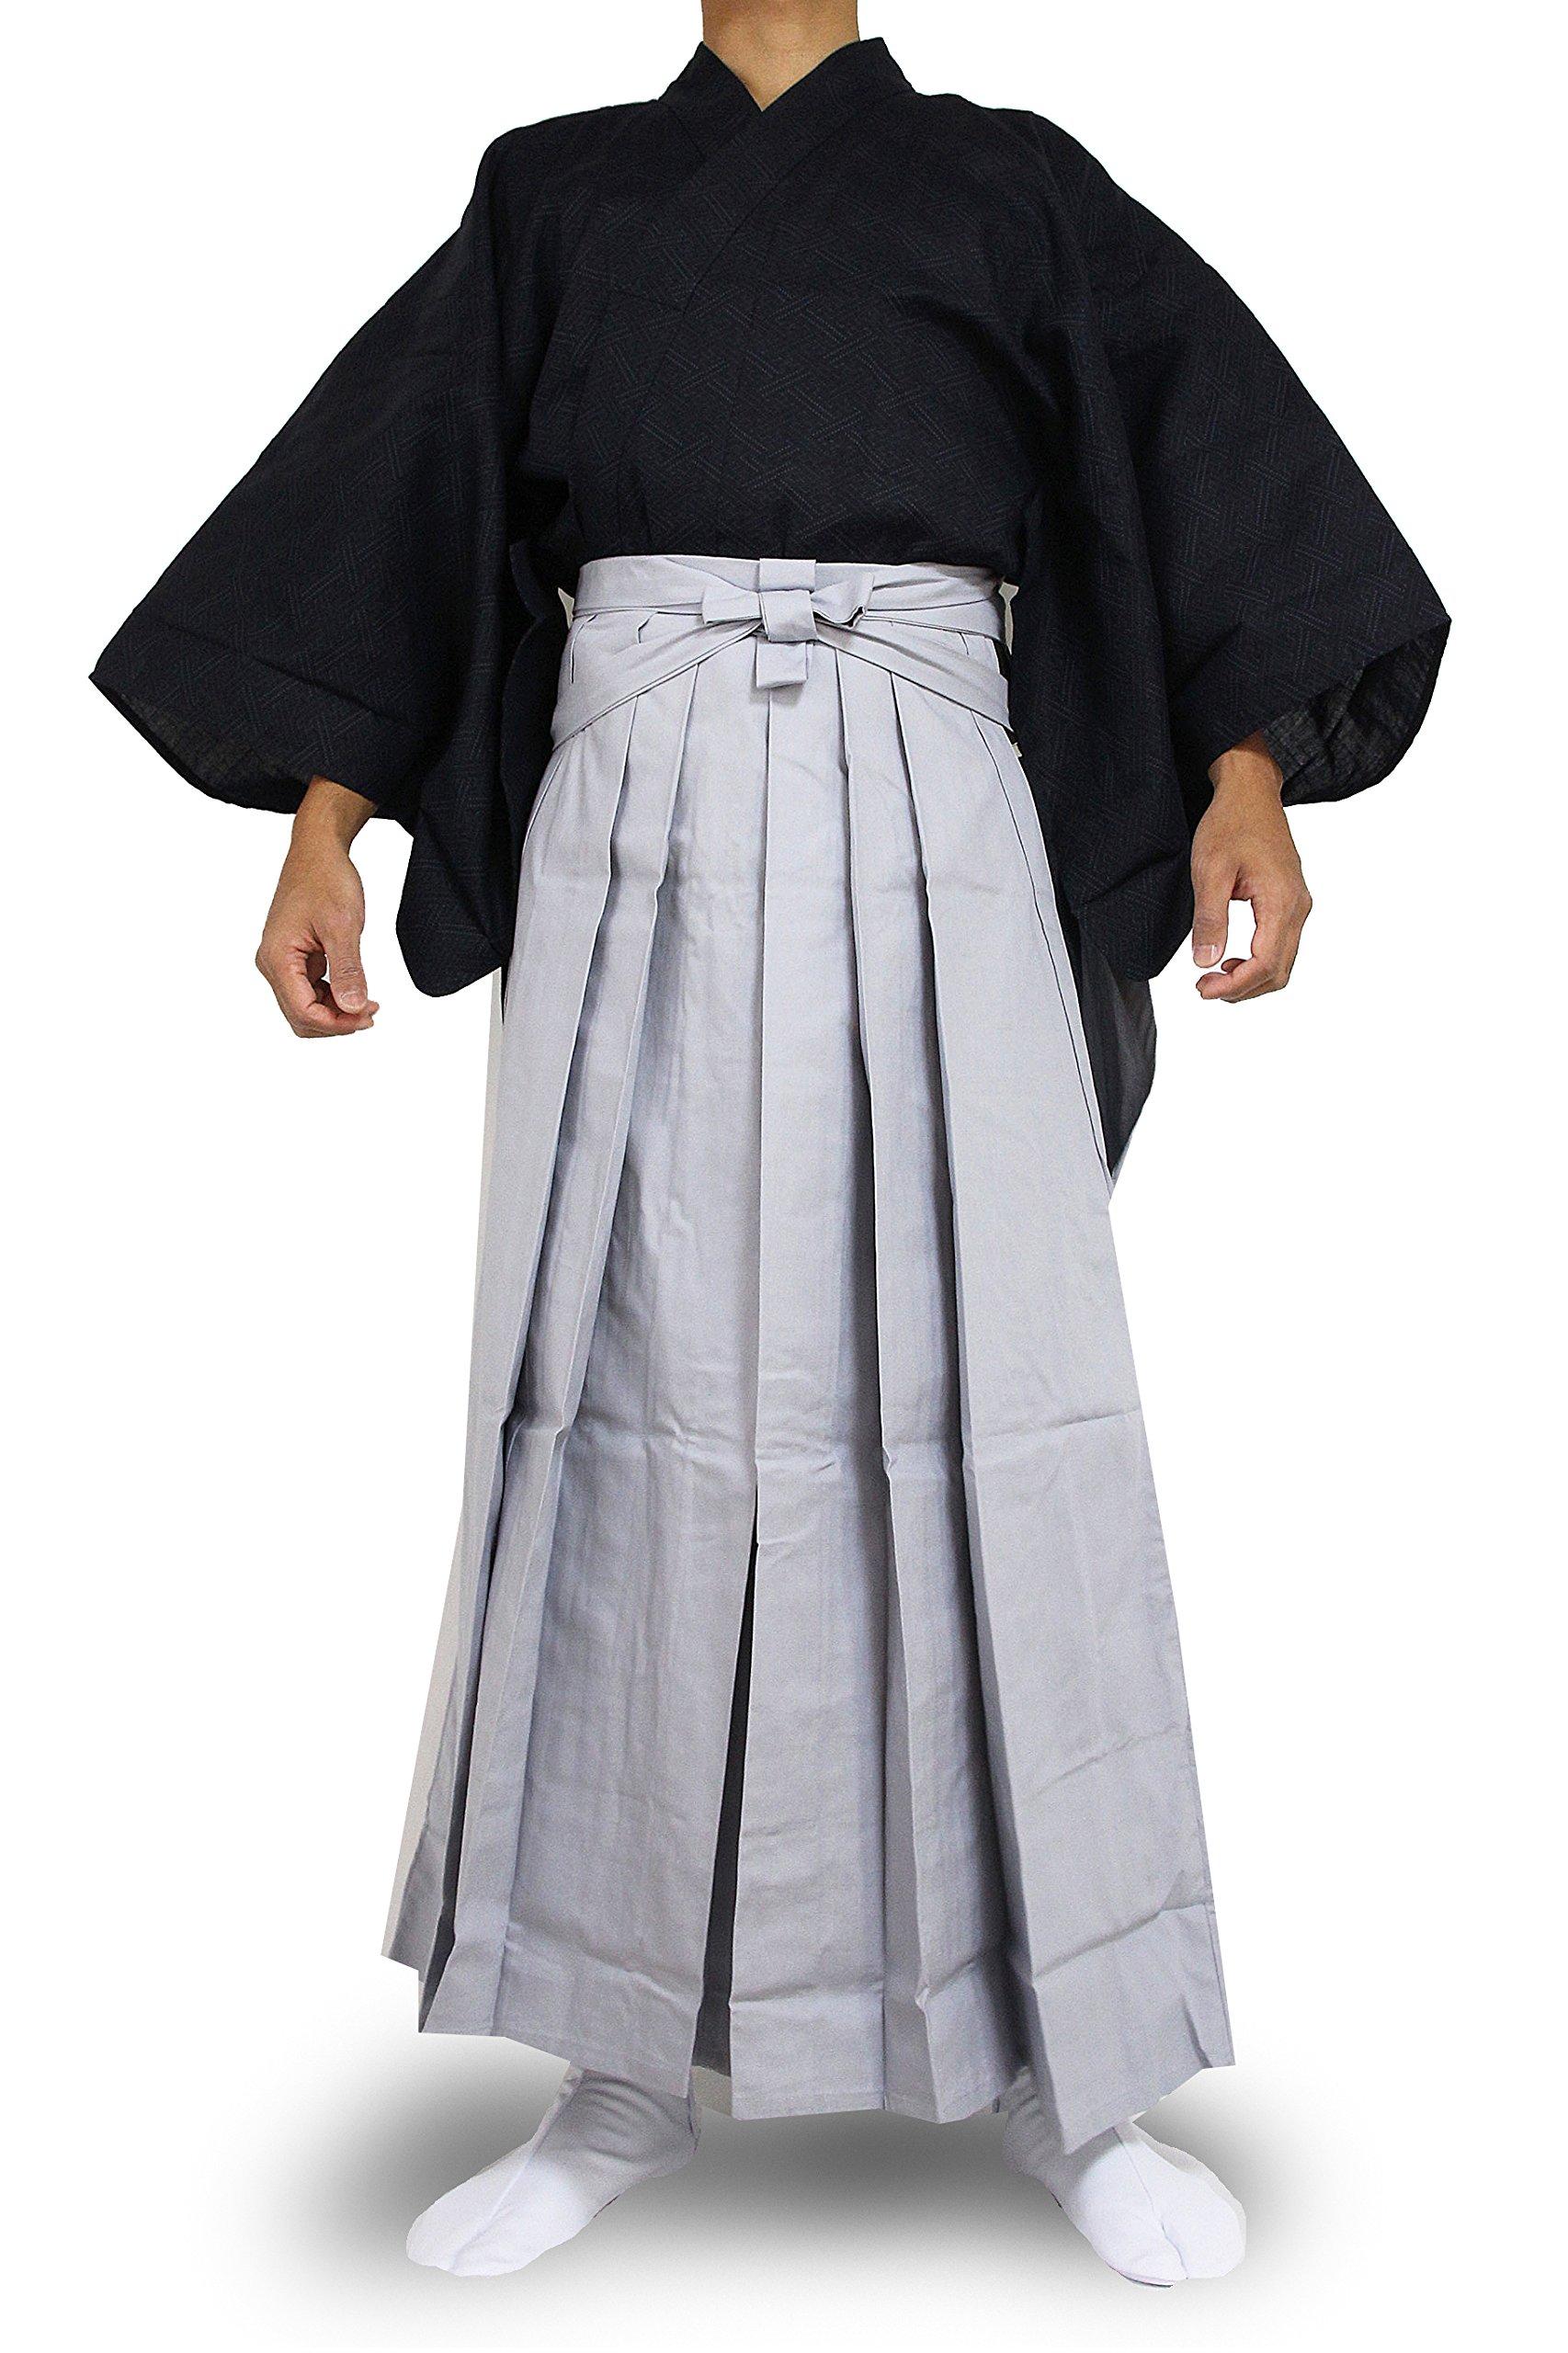 Edoten Japanese Samurai Hakama Uniform 1771NV-GY XL by Edoten (Image #1)